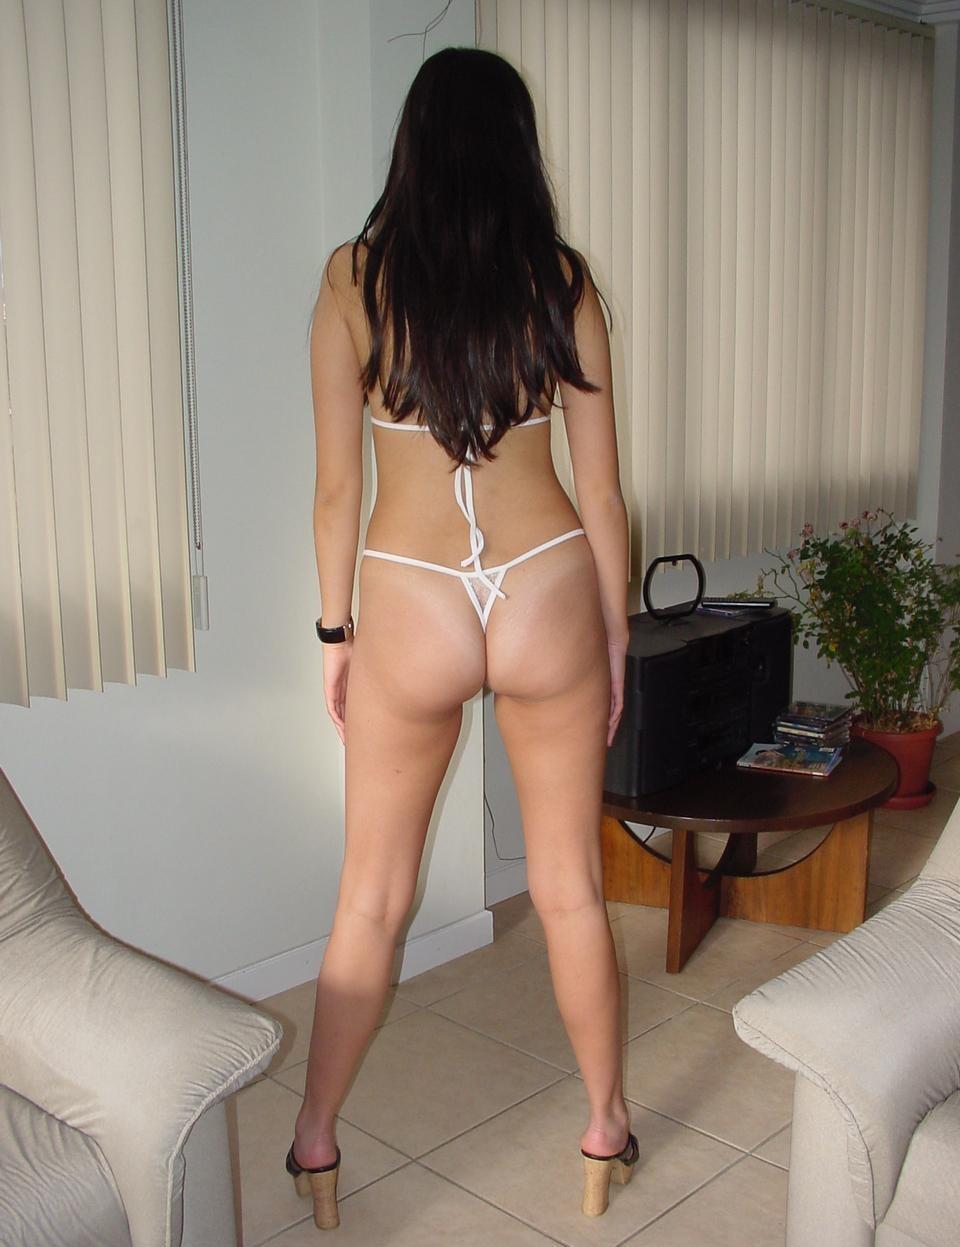 Симпатичная Диана из Эквадора